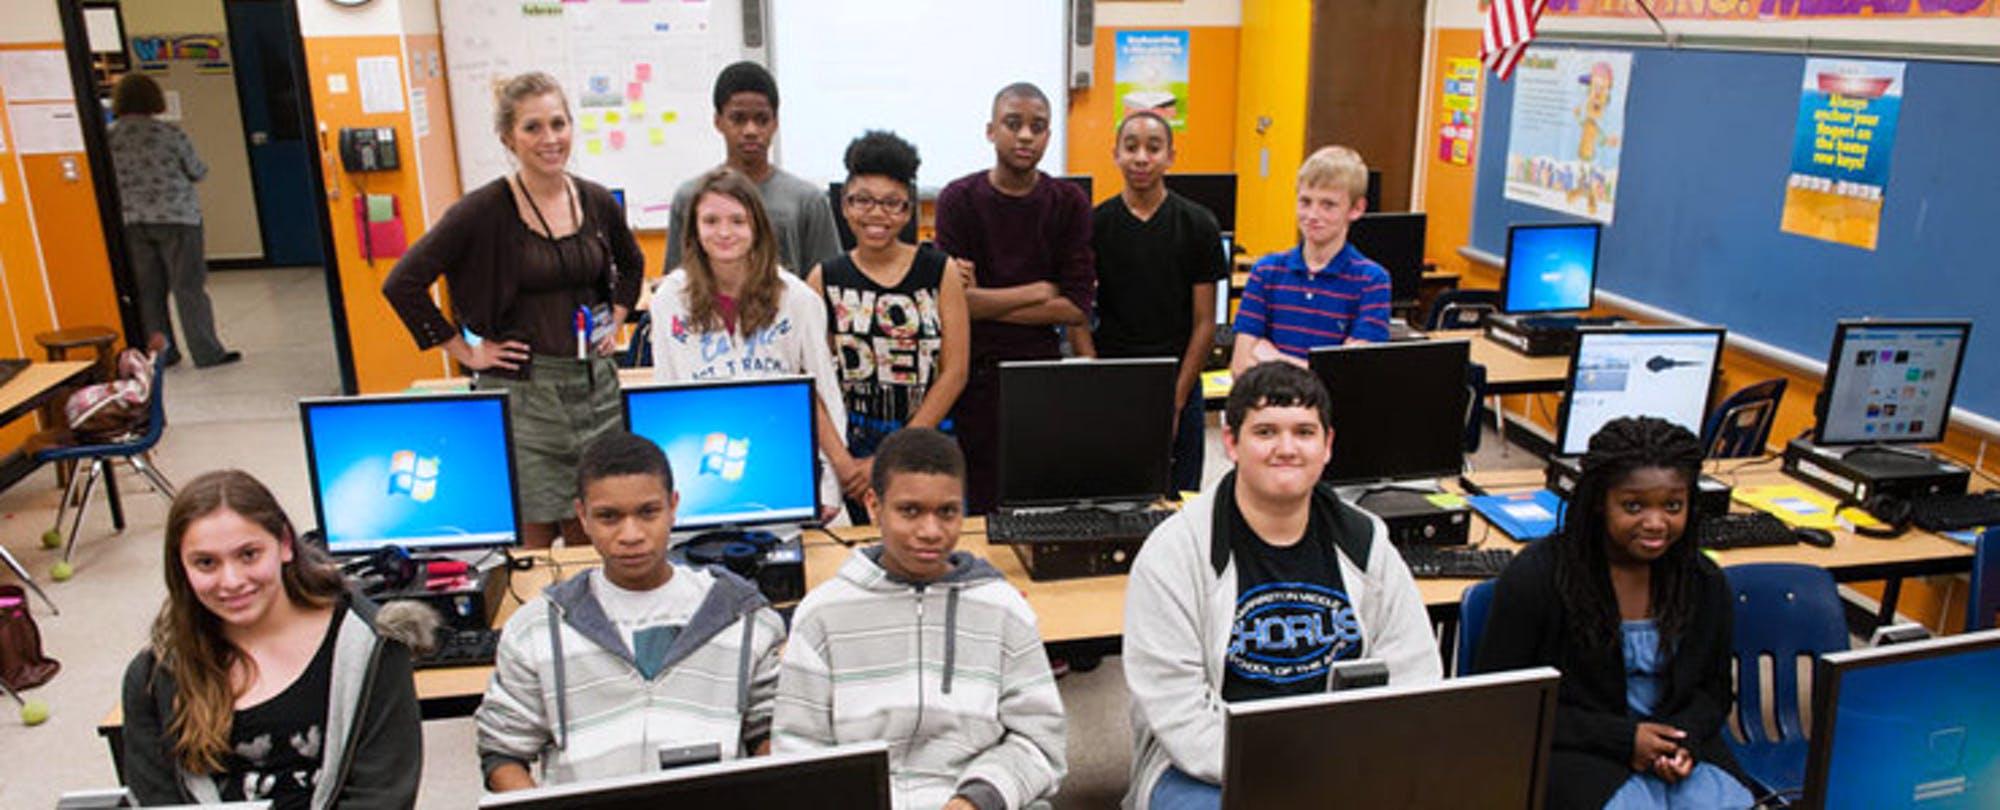 Fixing the Bugs: Teaching Kids to Code on a Zero-Dollar Budget